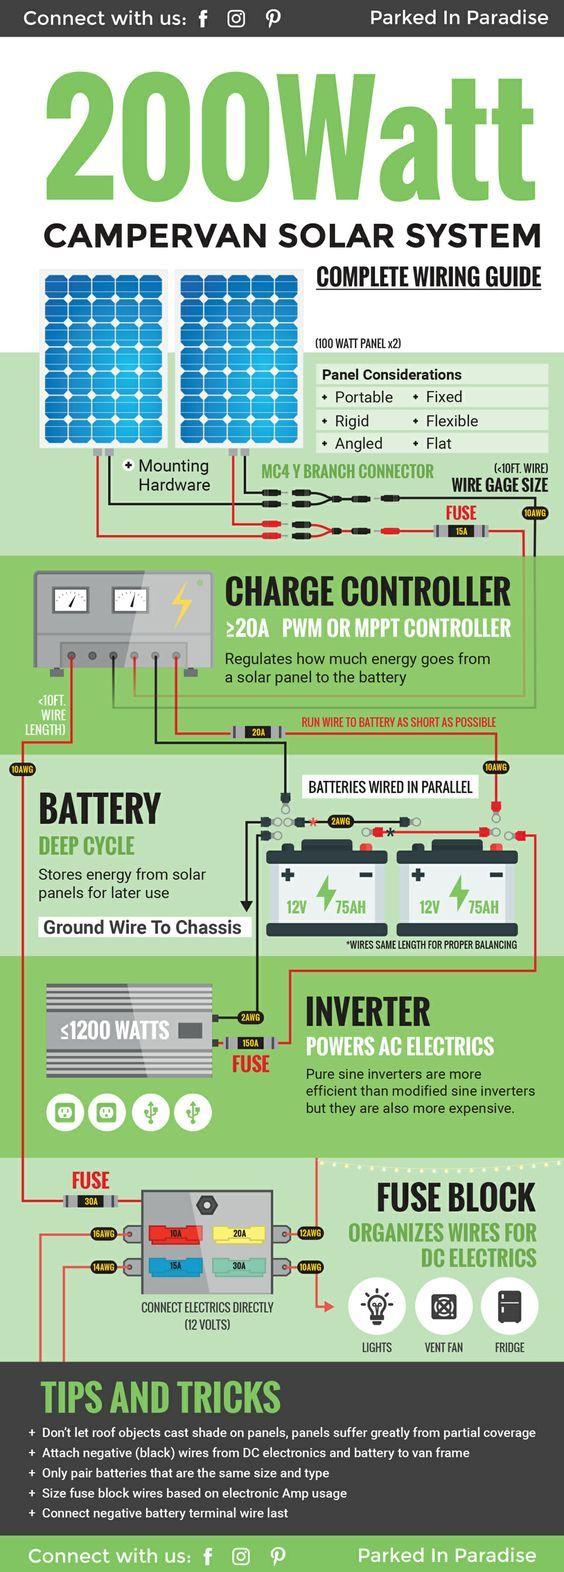 hight resolution of solar calculator and diy wiring diagrams vw lt 35 motorhome upgrade solar panel system campervan solar panels